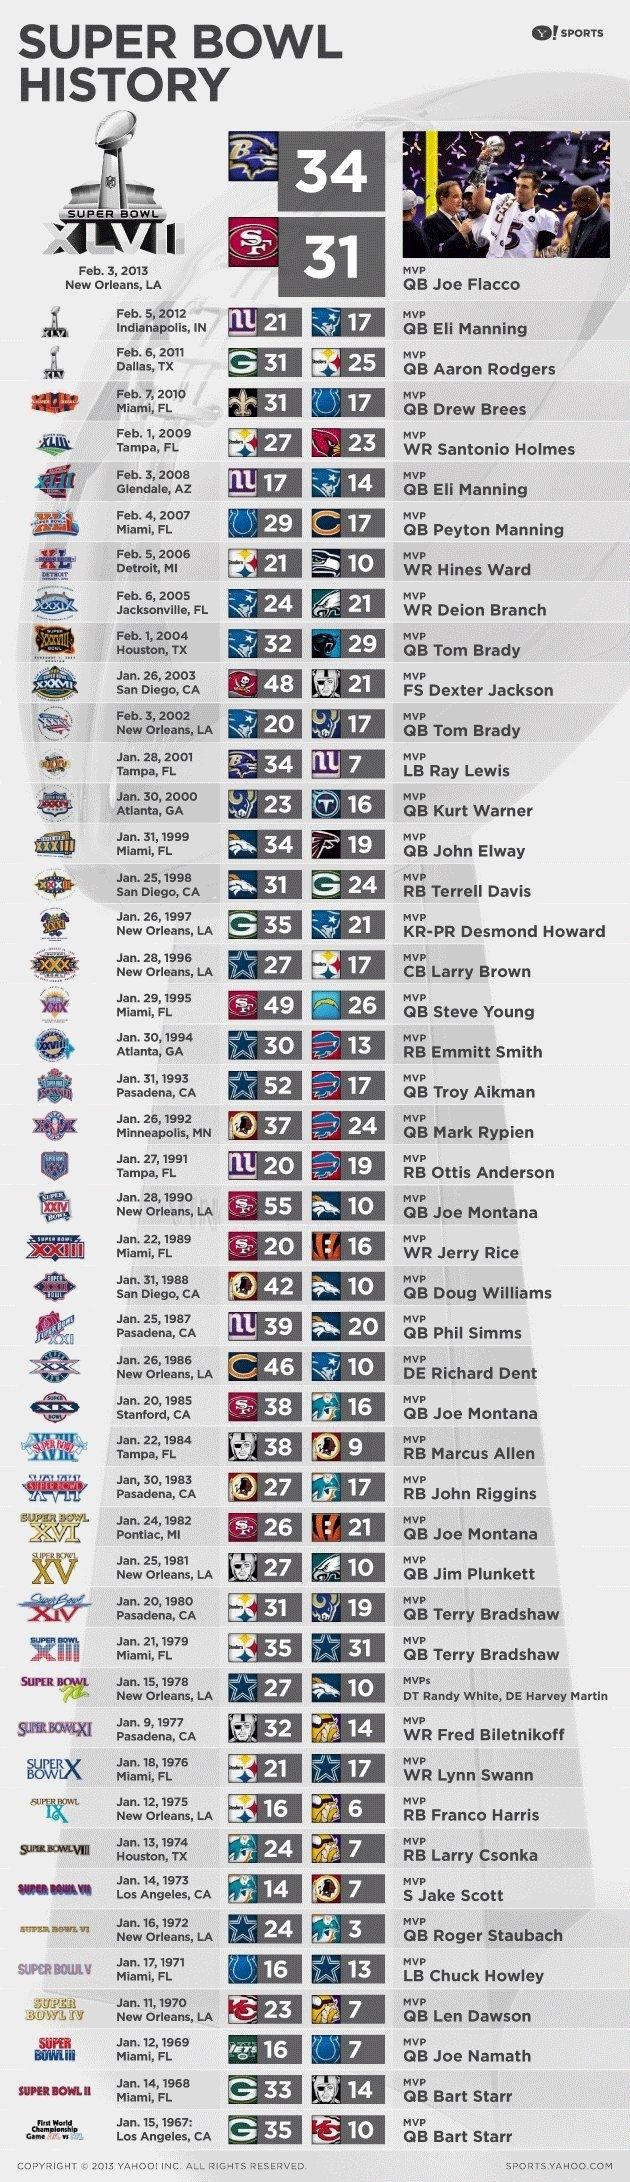 Super Bowl History | Football | Sport Fussball in Super Bowl Winner List